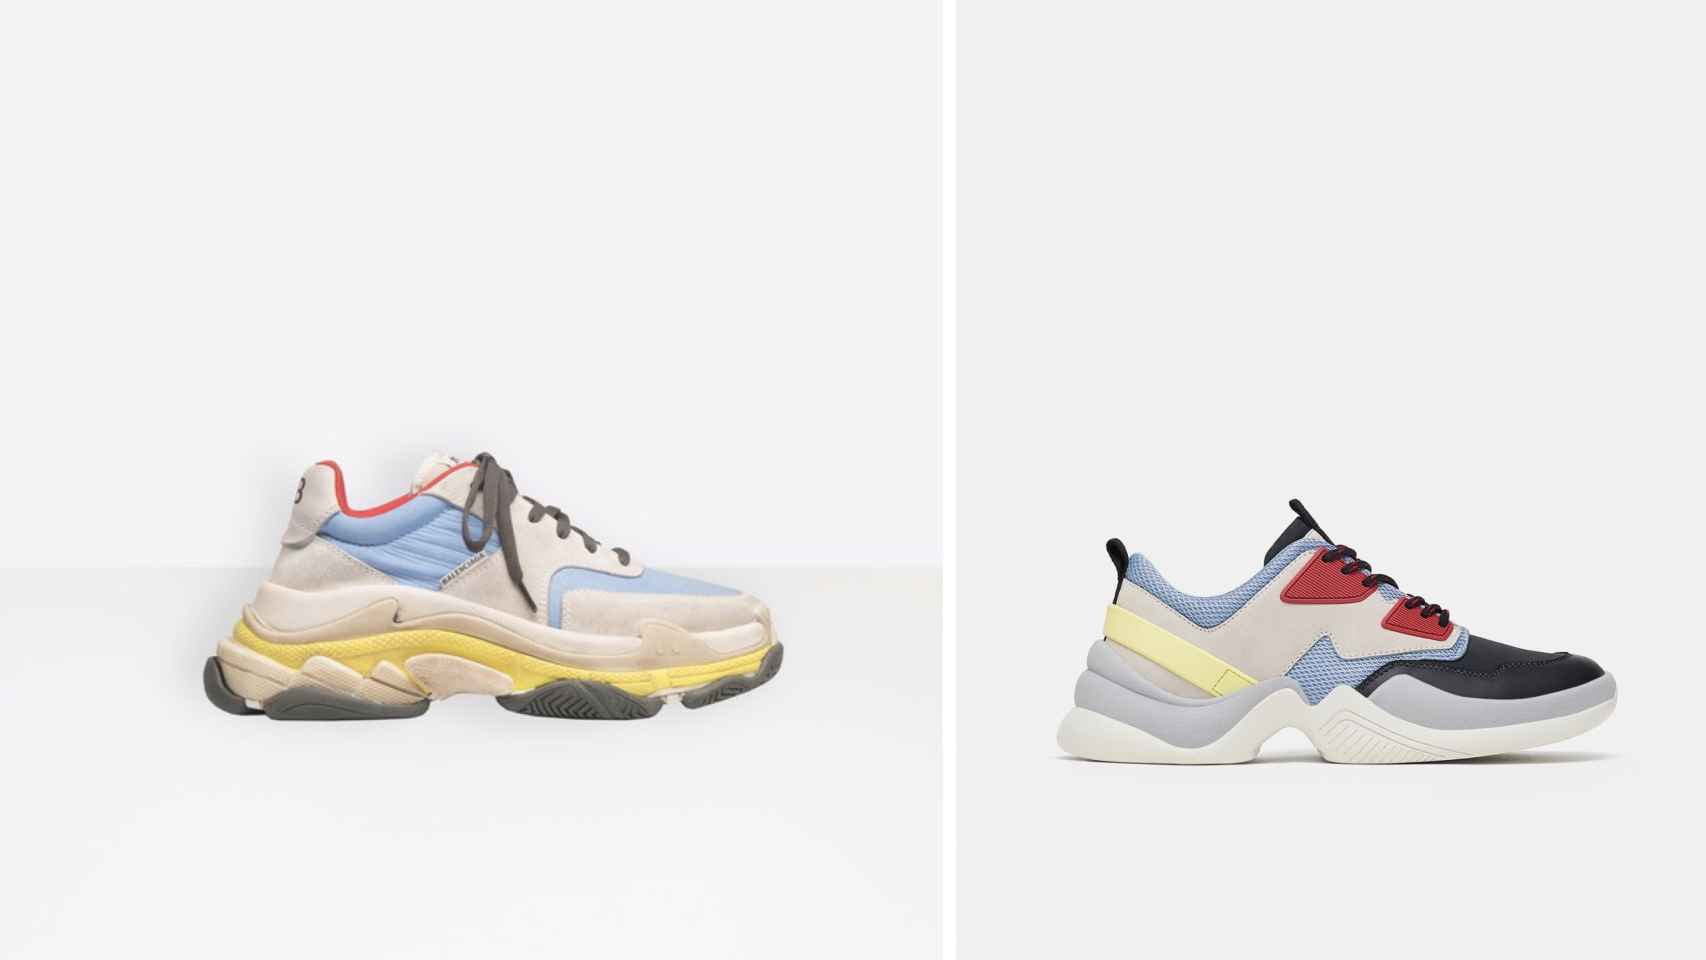 sala Kent Sudán  Inditex replica las famosas zapatillas de Balenciaga